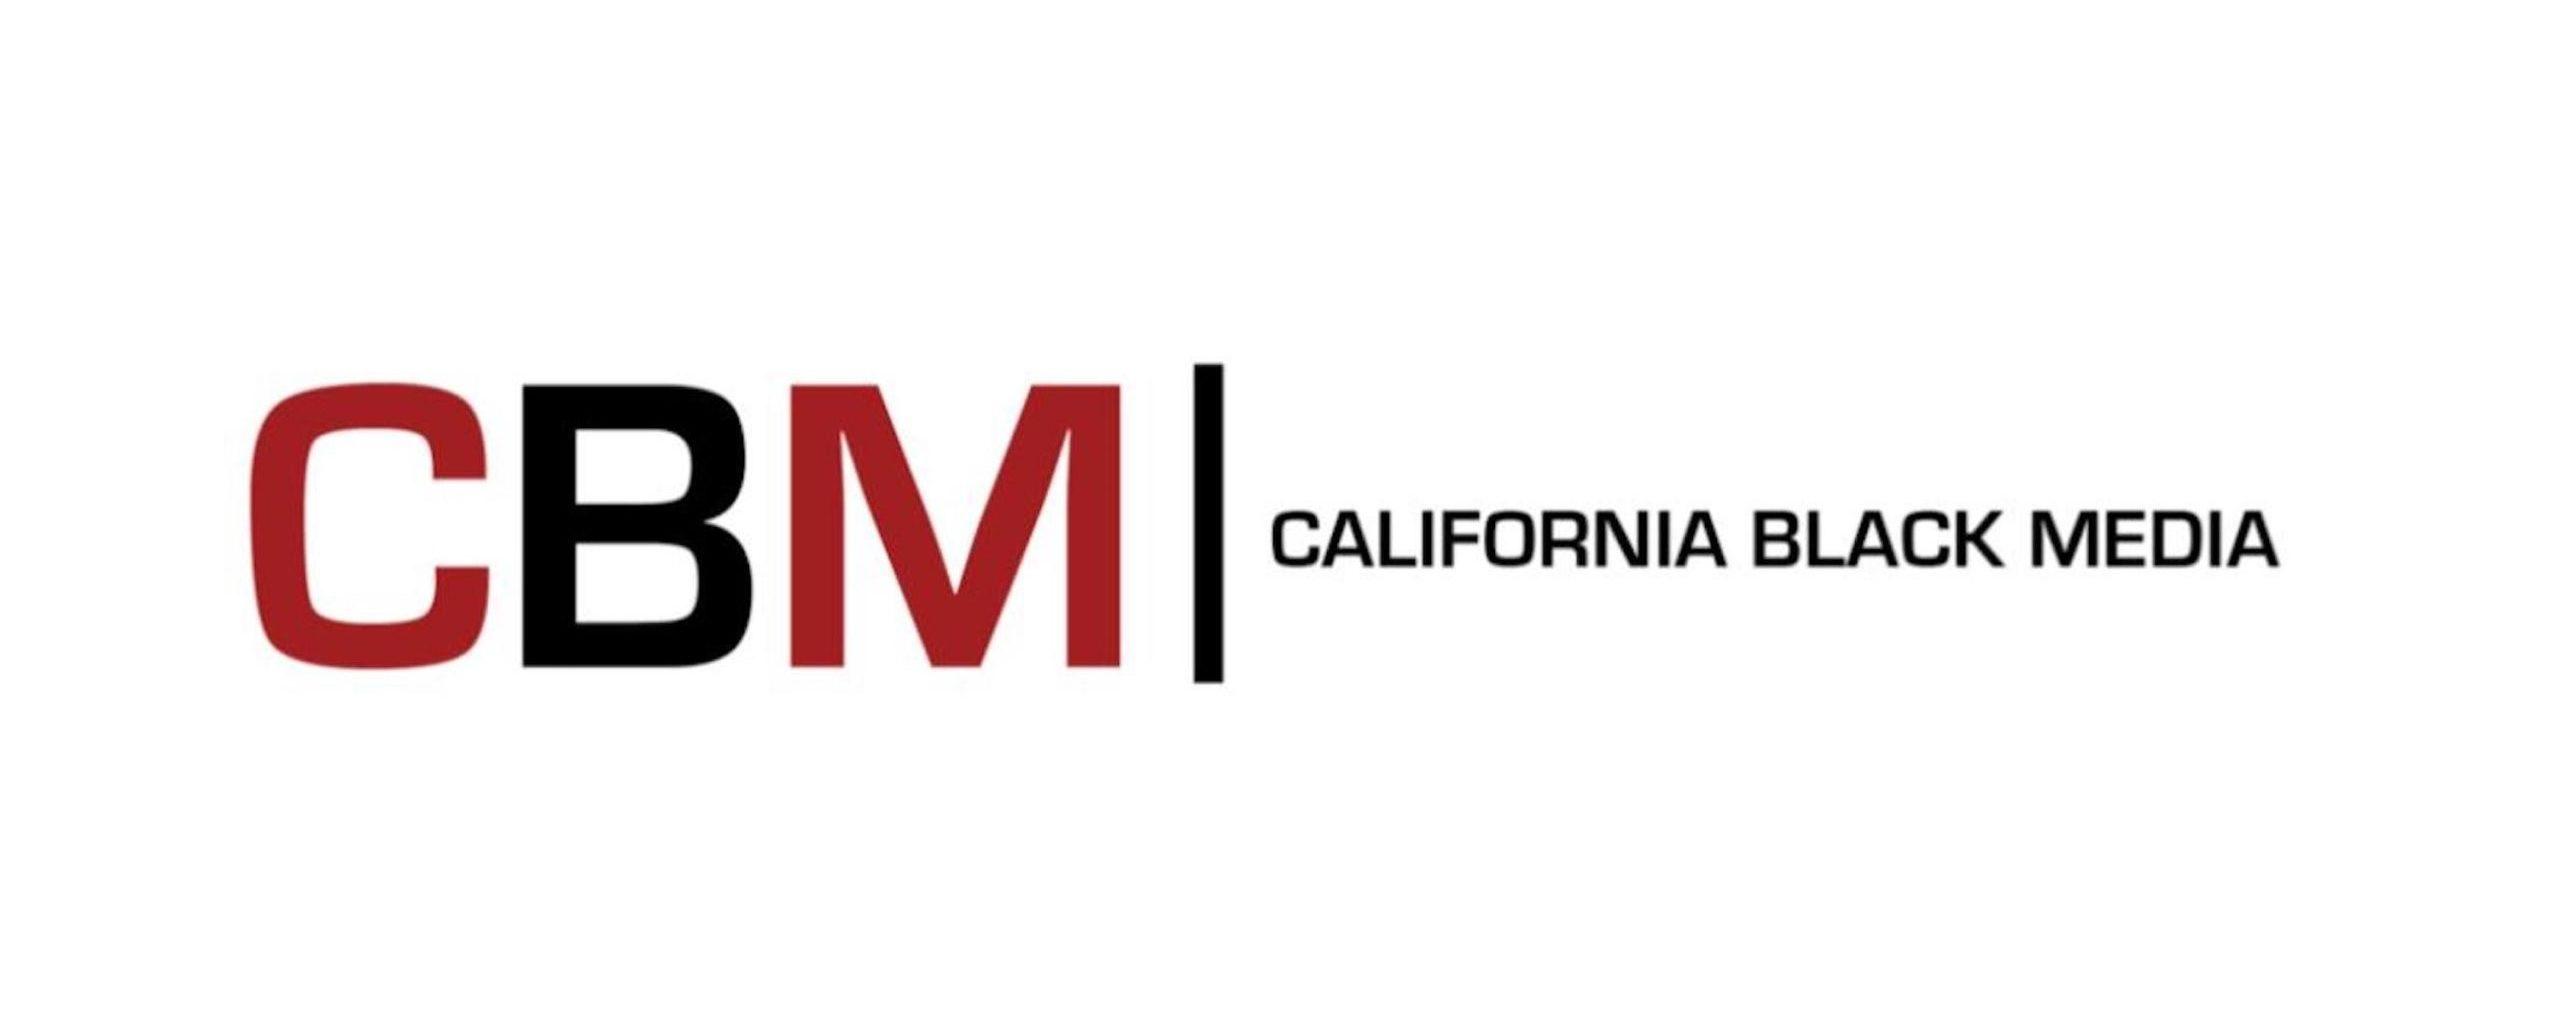 California Black Media